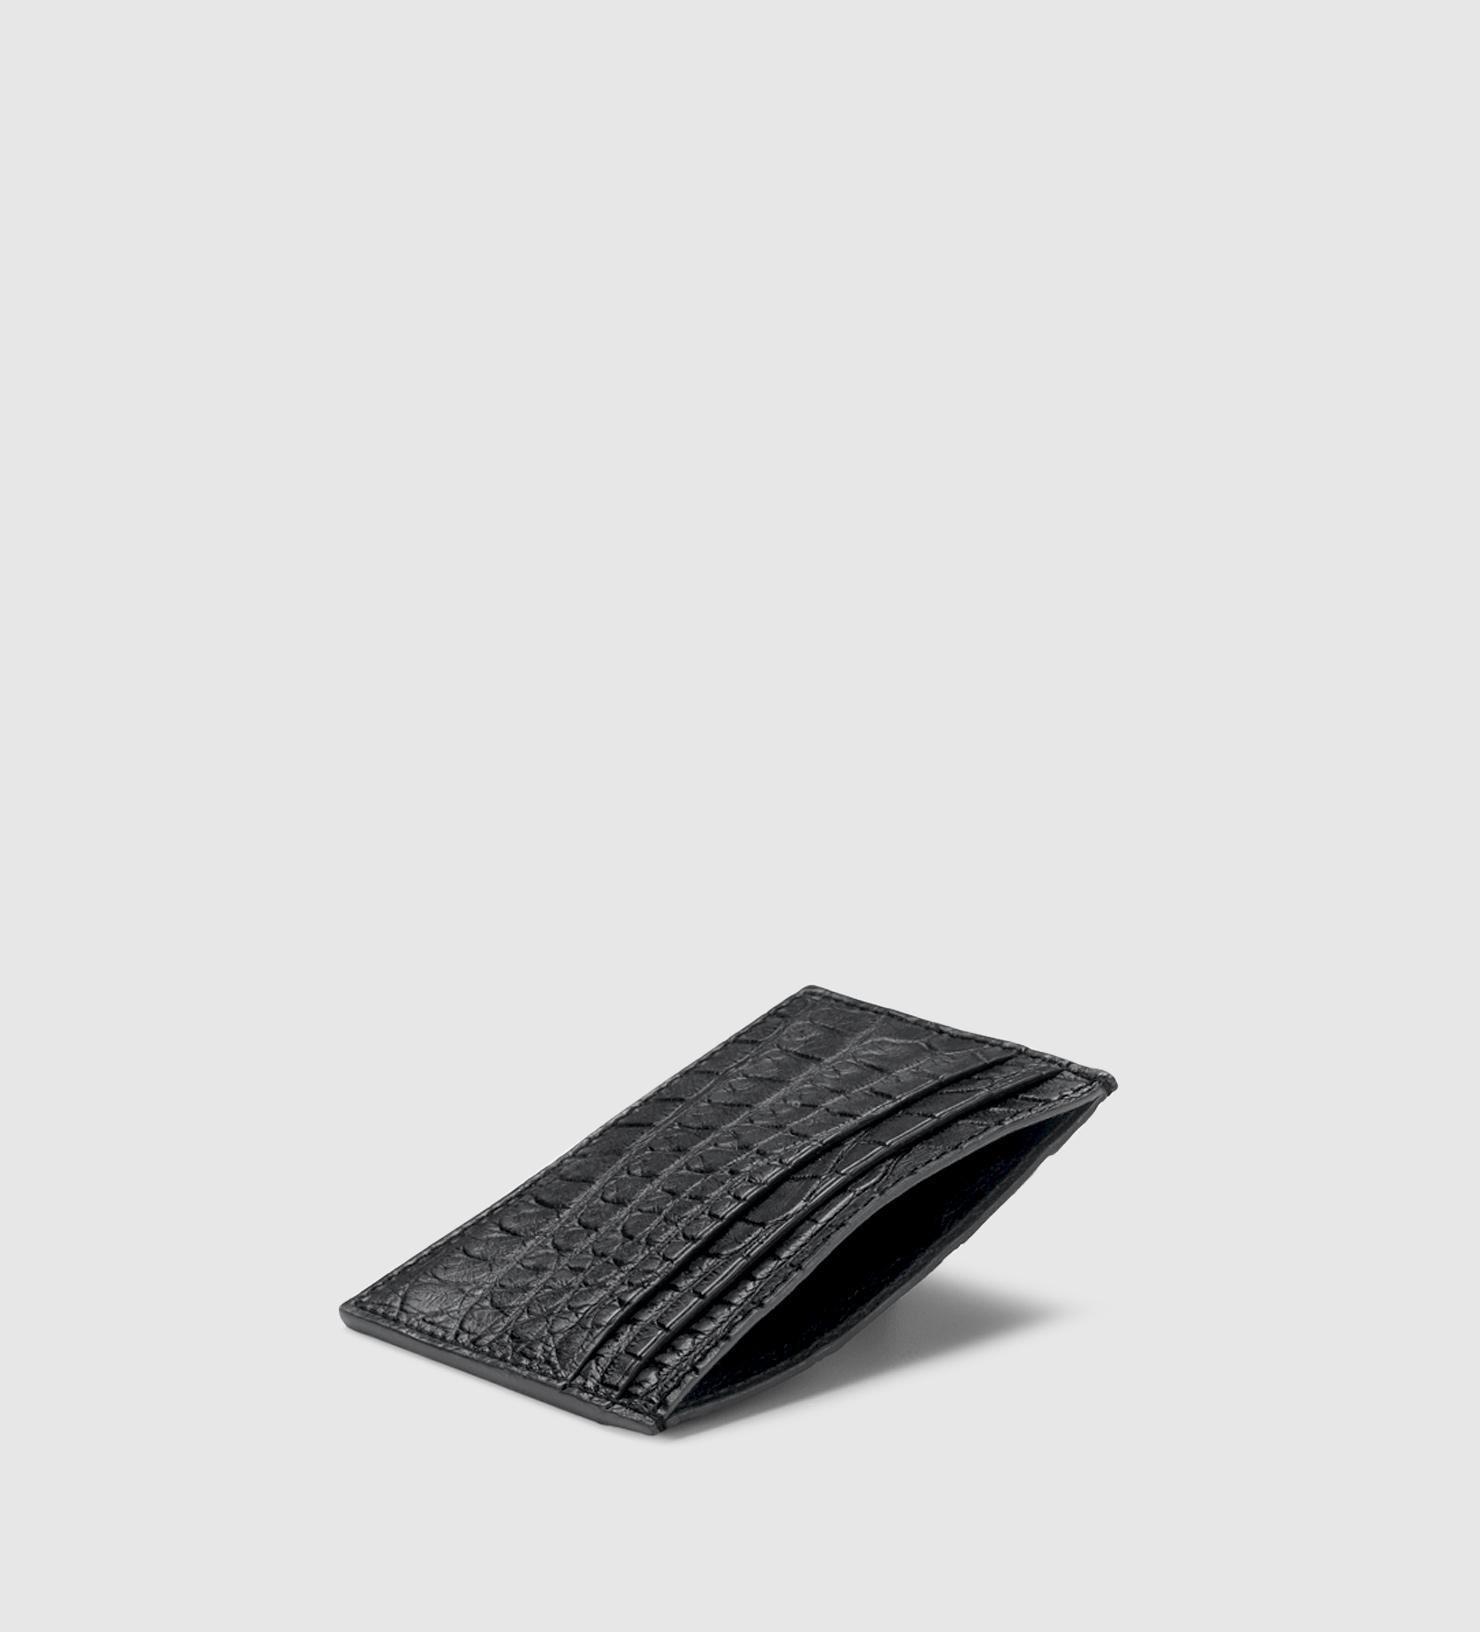 Lyst - Gucci Crocodile Card Case in Black for Men